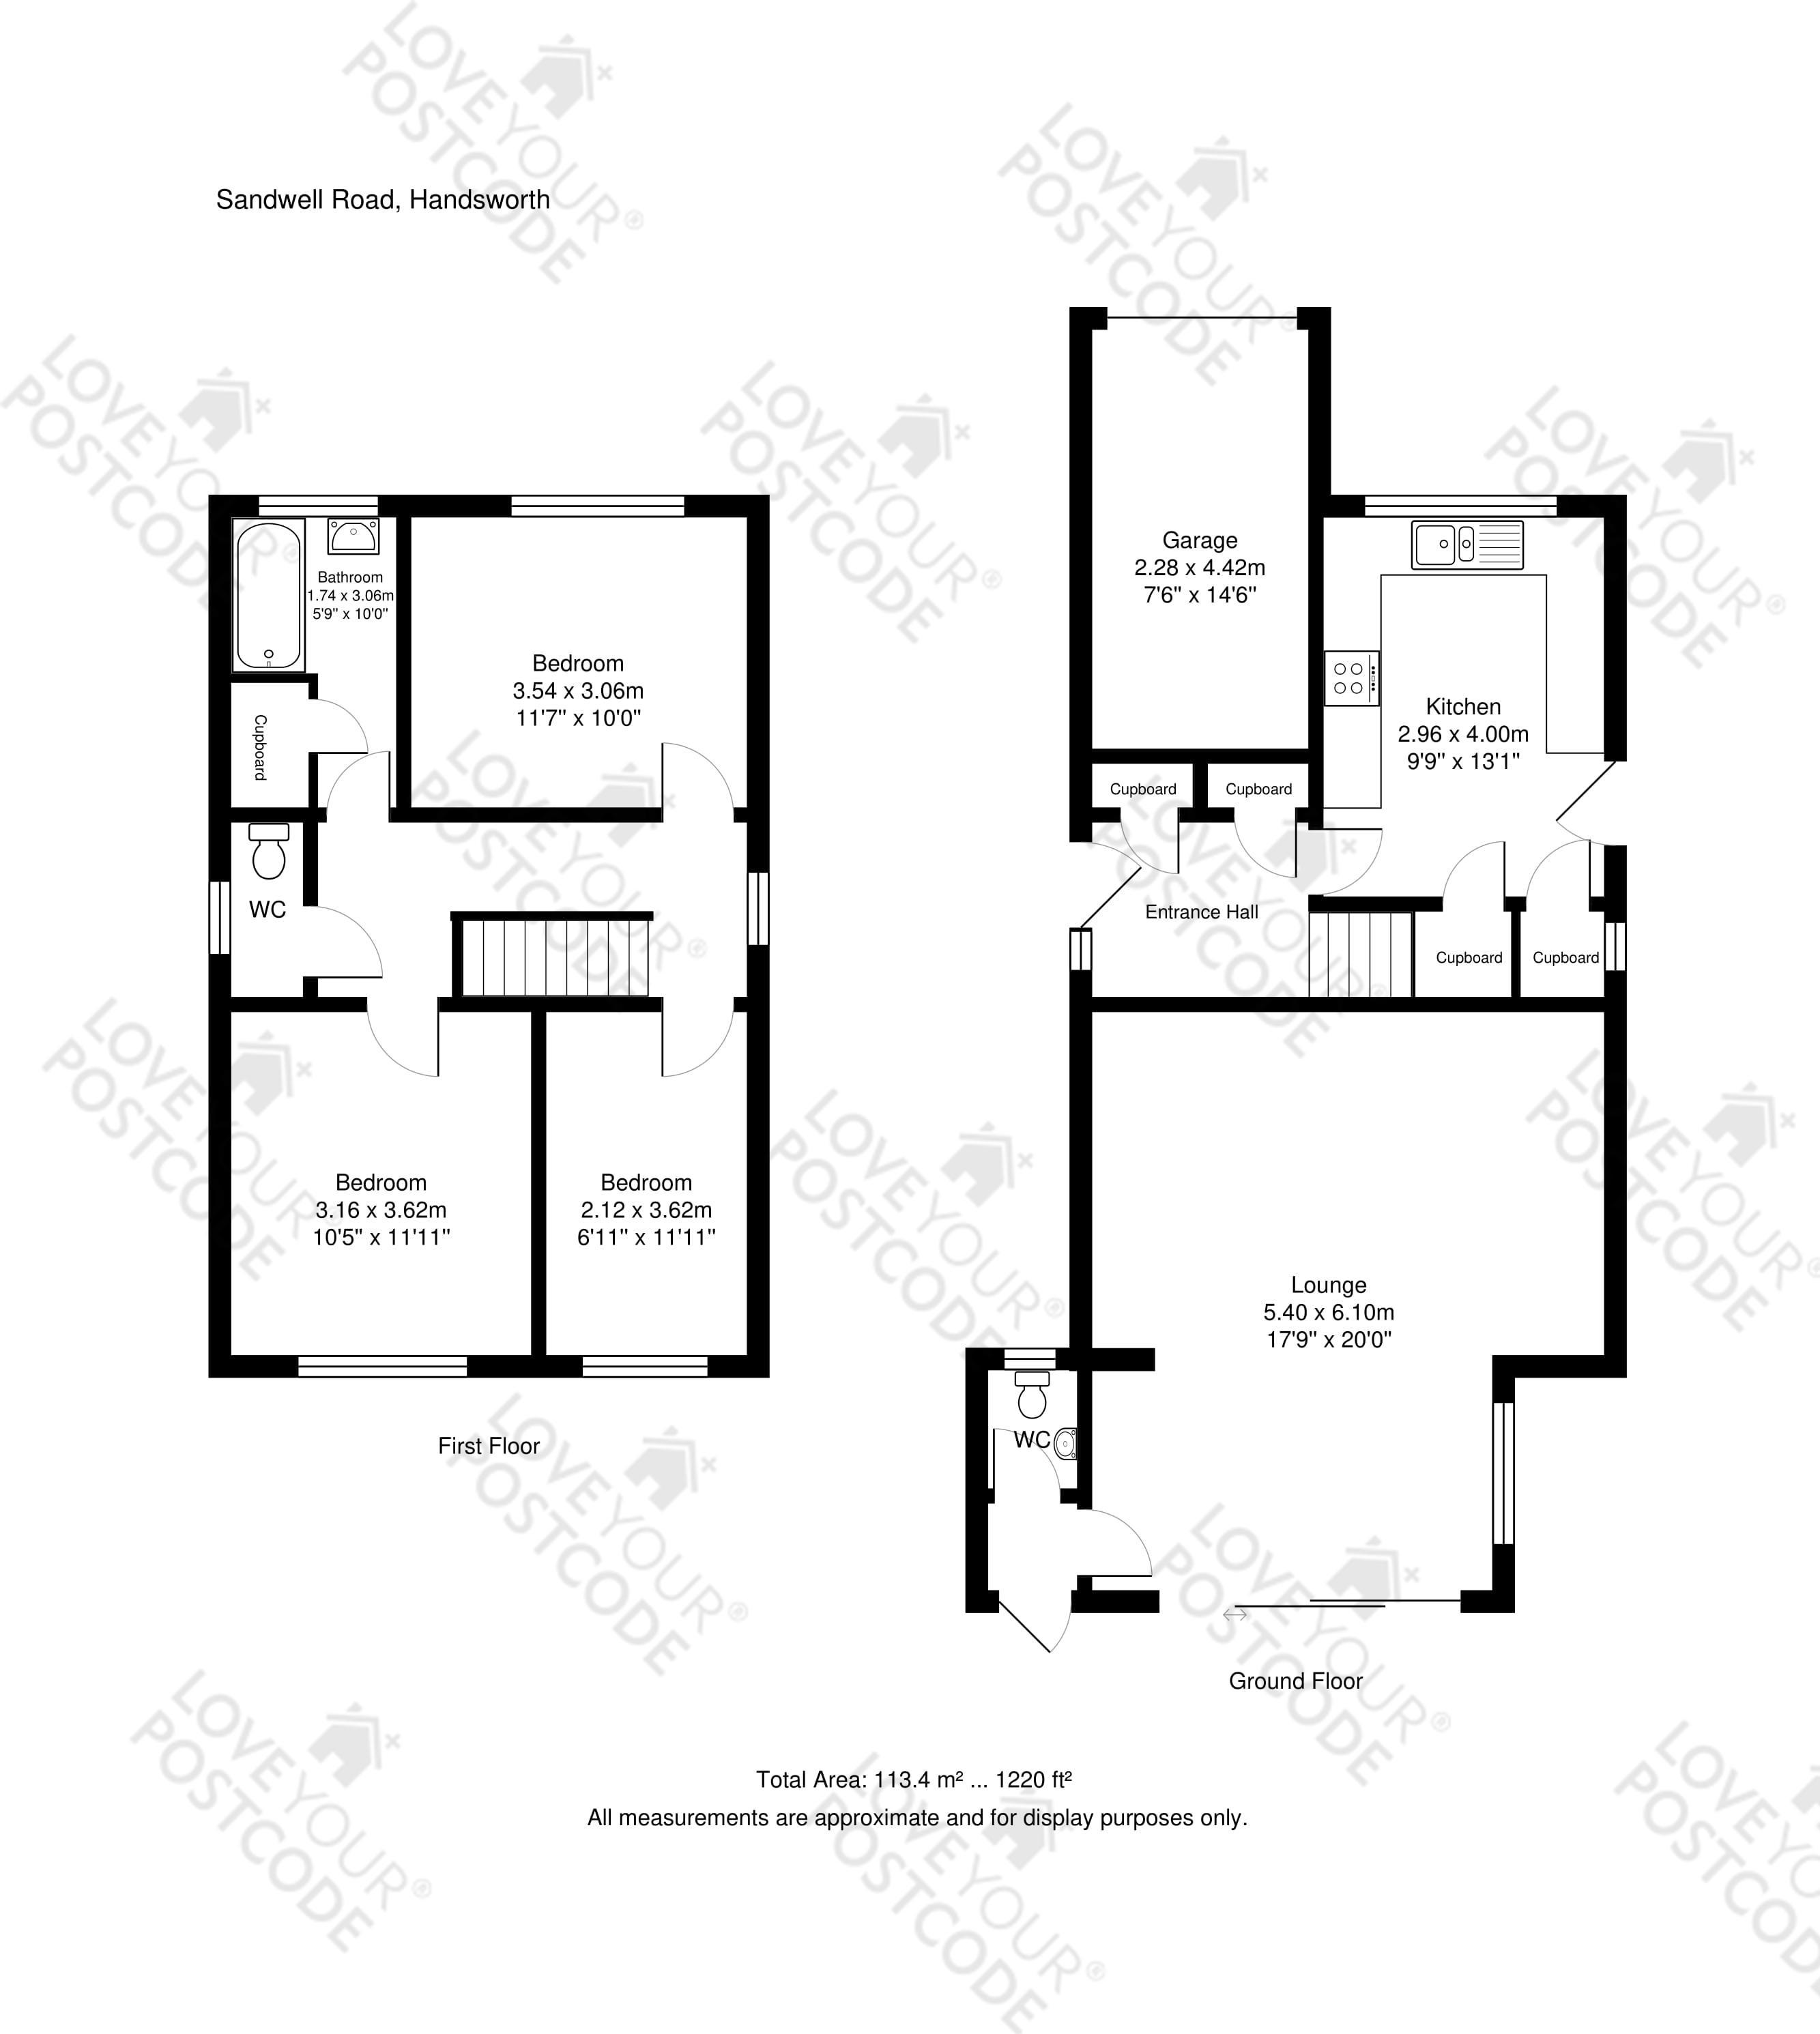 Sandwell Road Handsworth Wood Birmingham B21 3 Bedroom Detached House For Sale